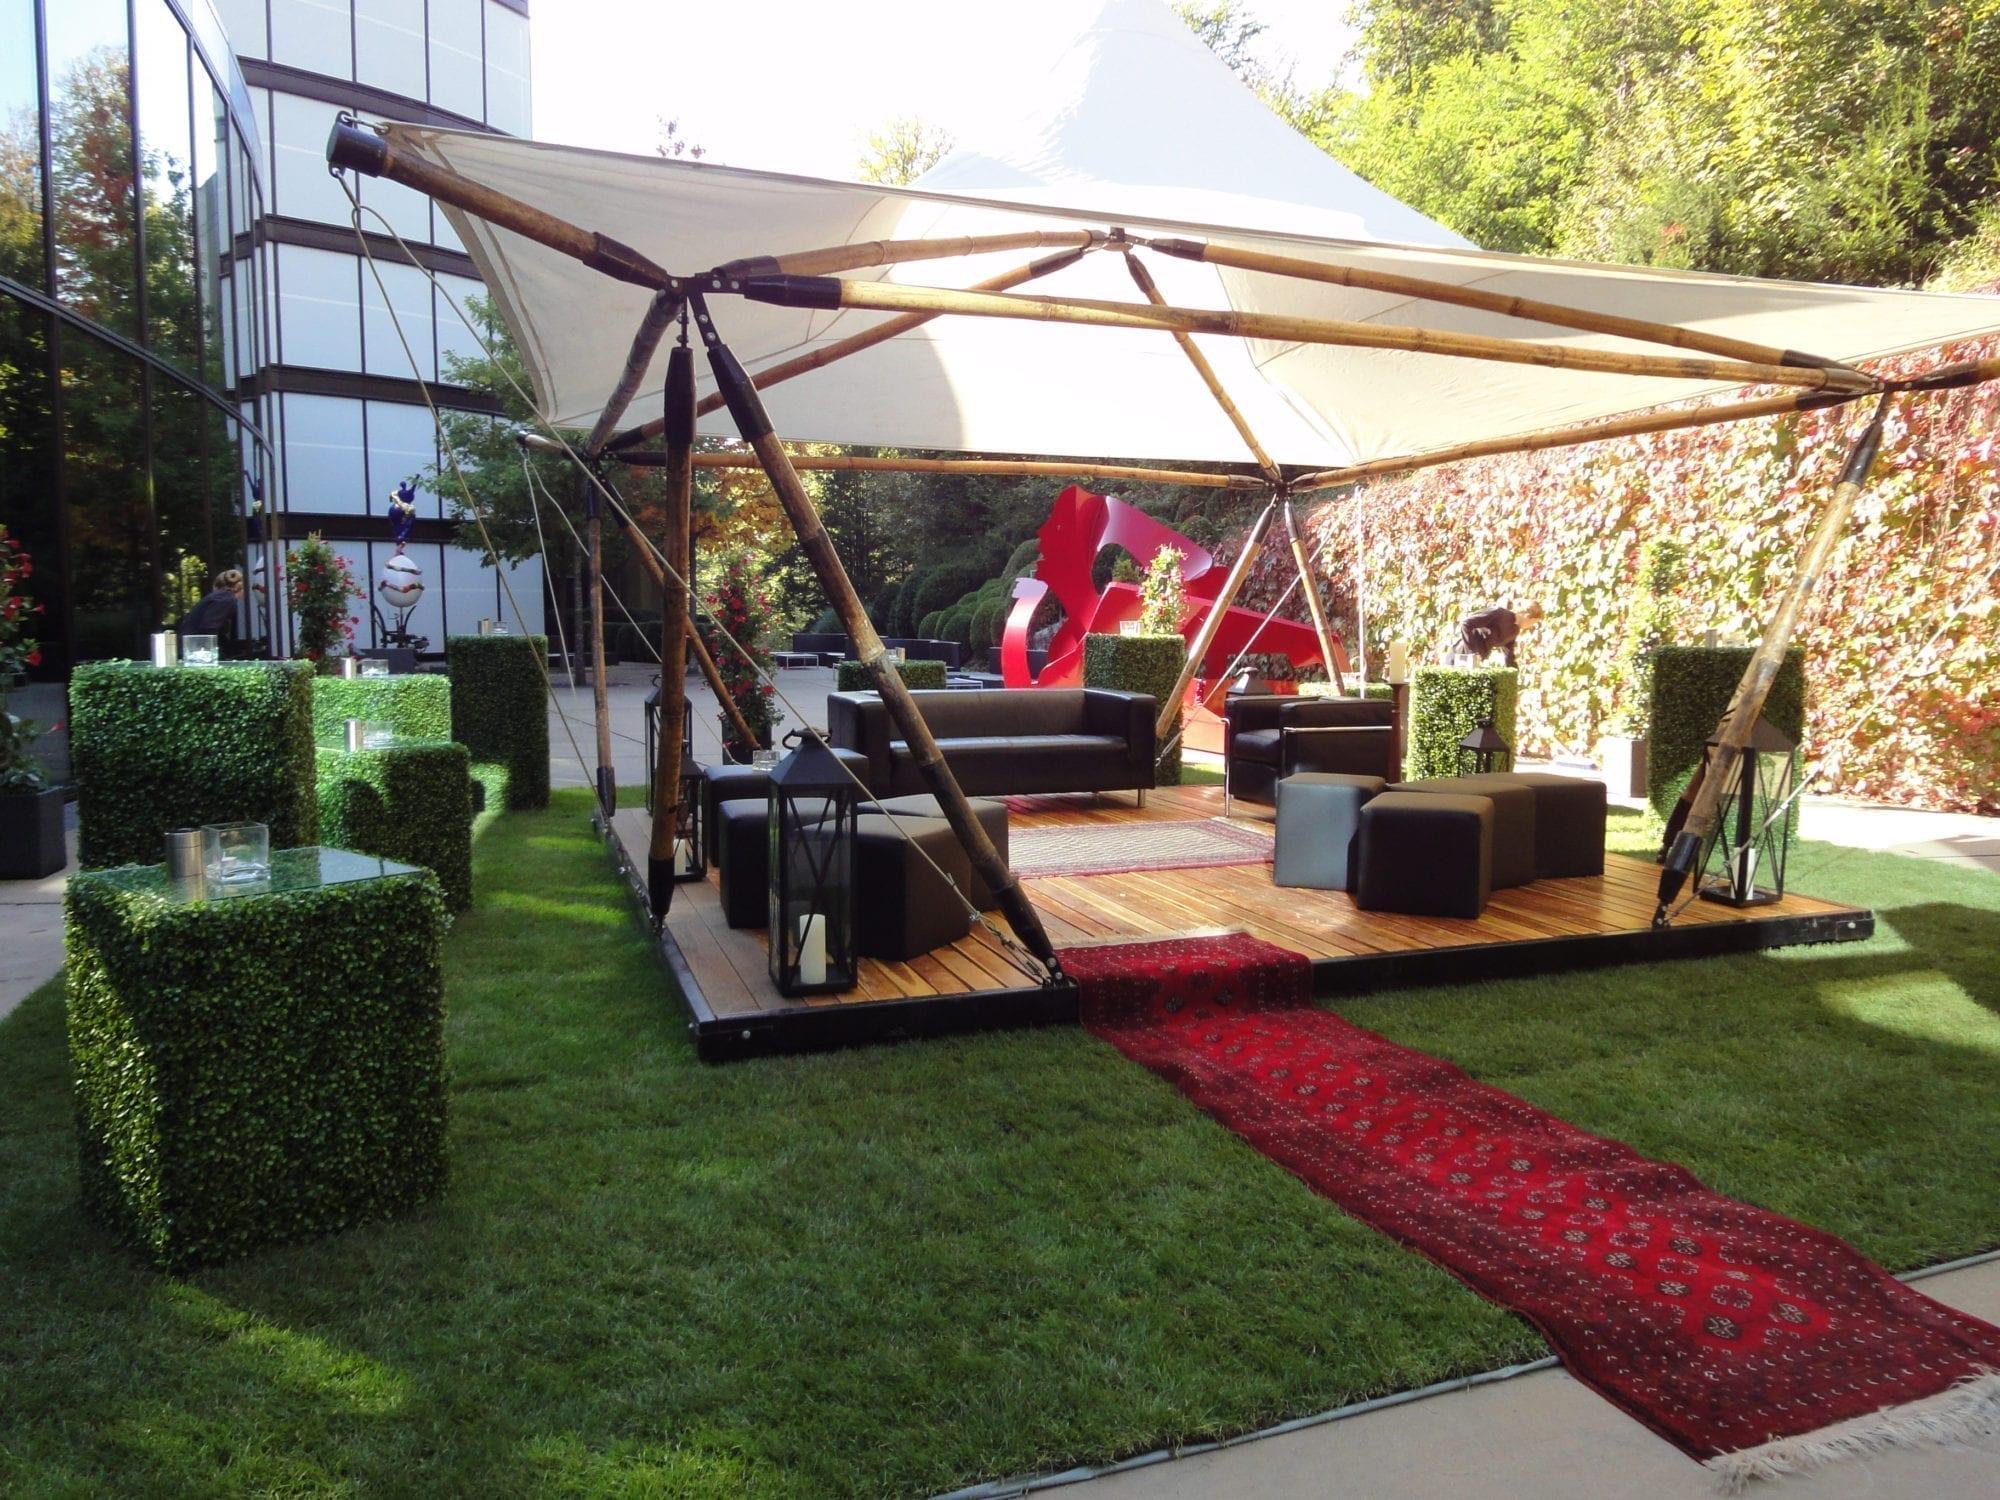 bambus pavillon mieten rent-a-lounge 5